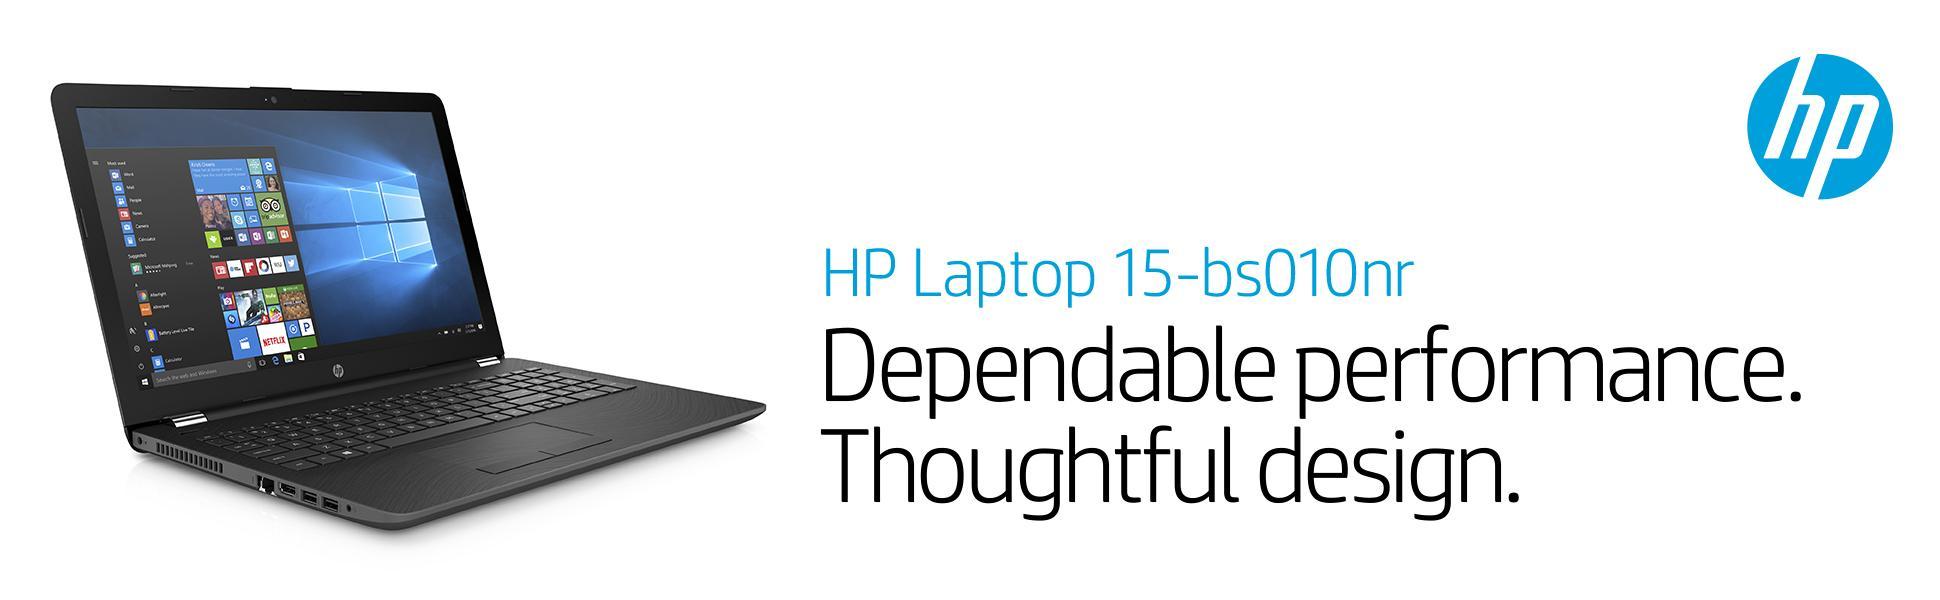 Amazon.com  HP 15-inch Laptop, Intel Pentium N3710, 4GB RAM, 1TB ... 008511c8081e